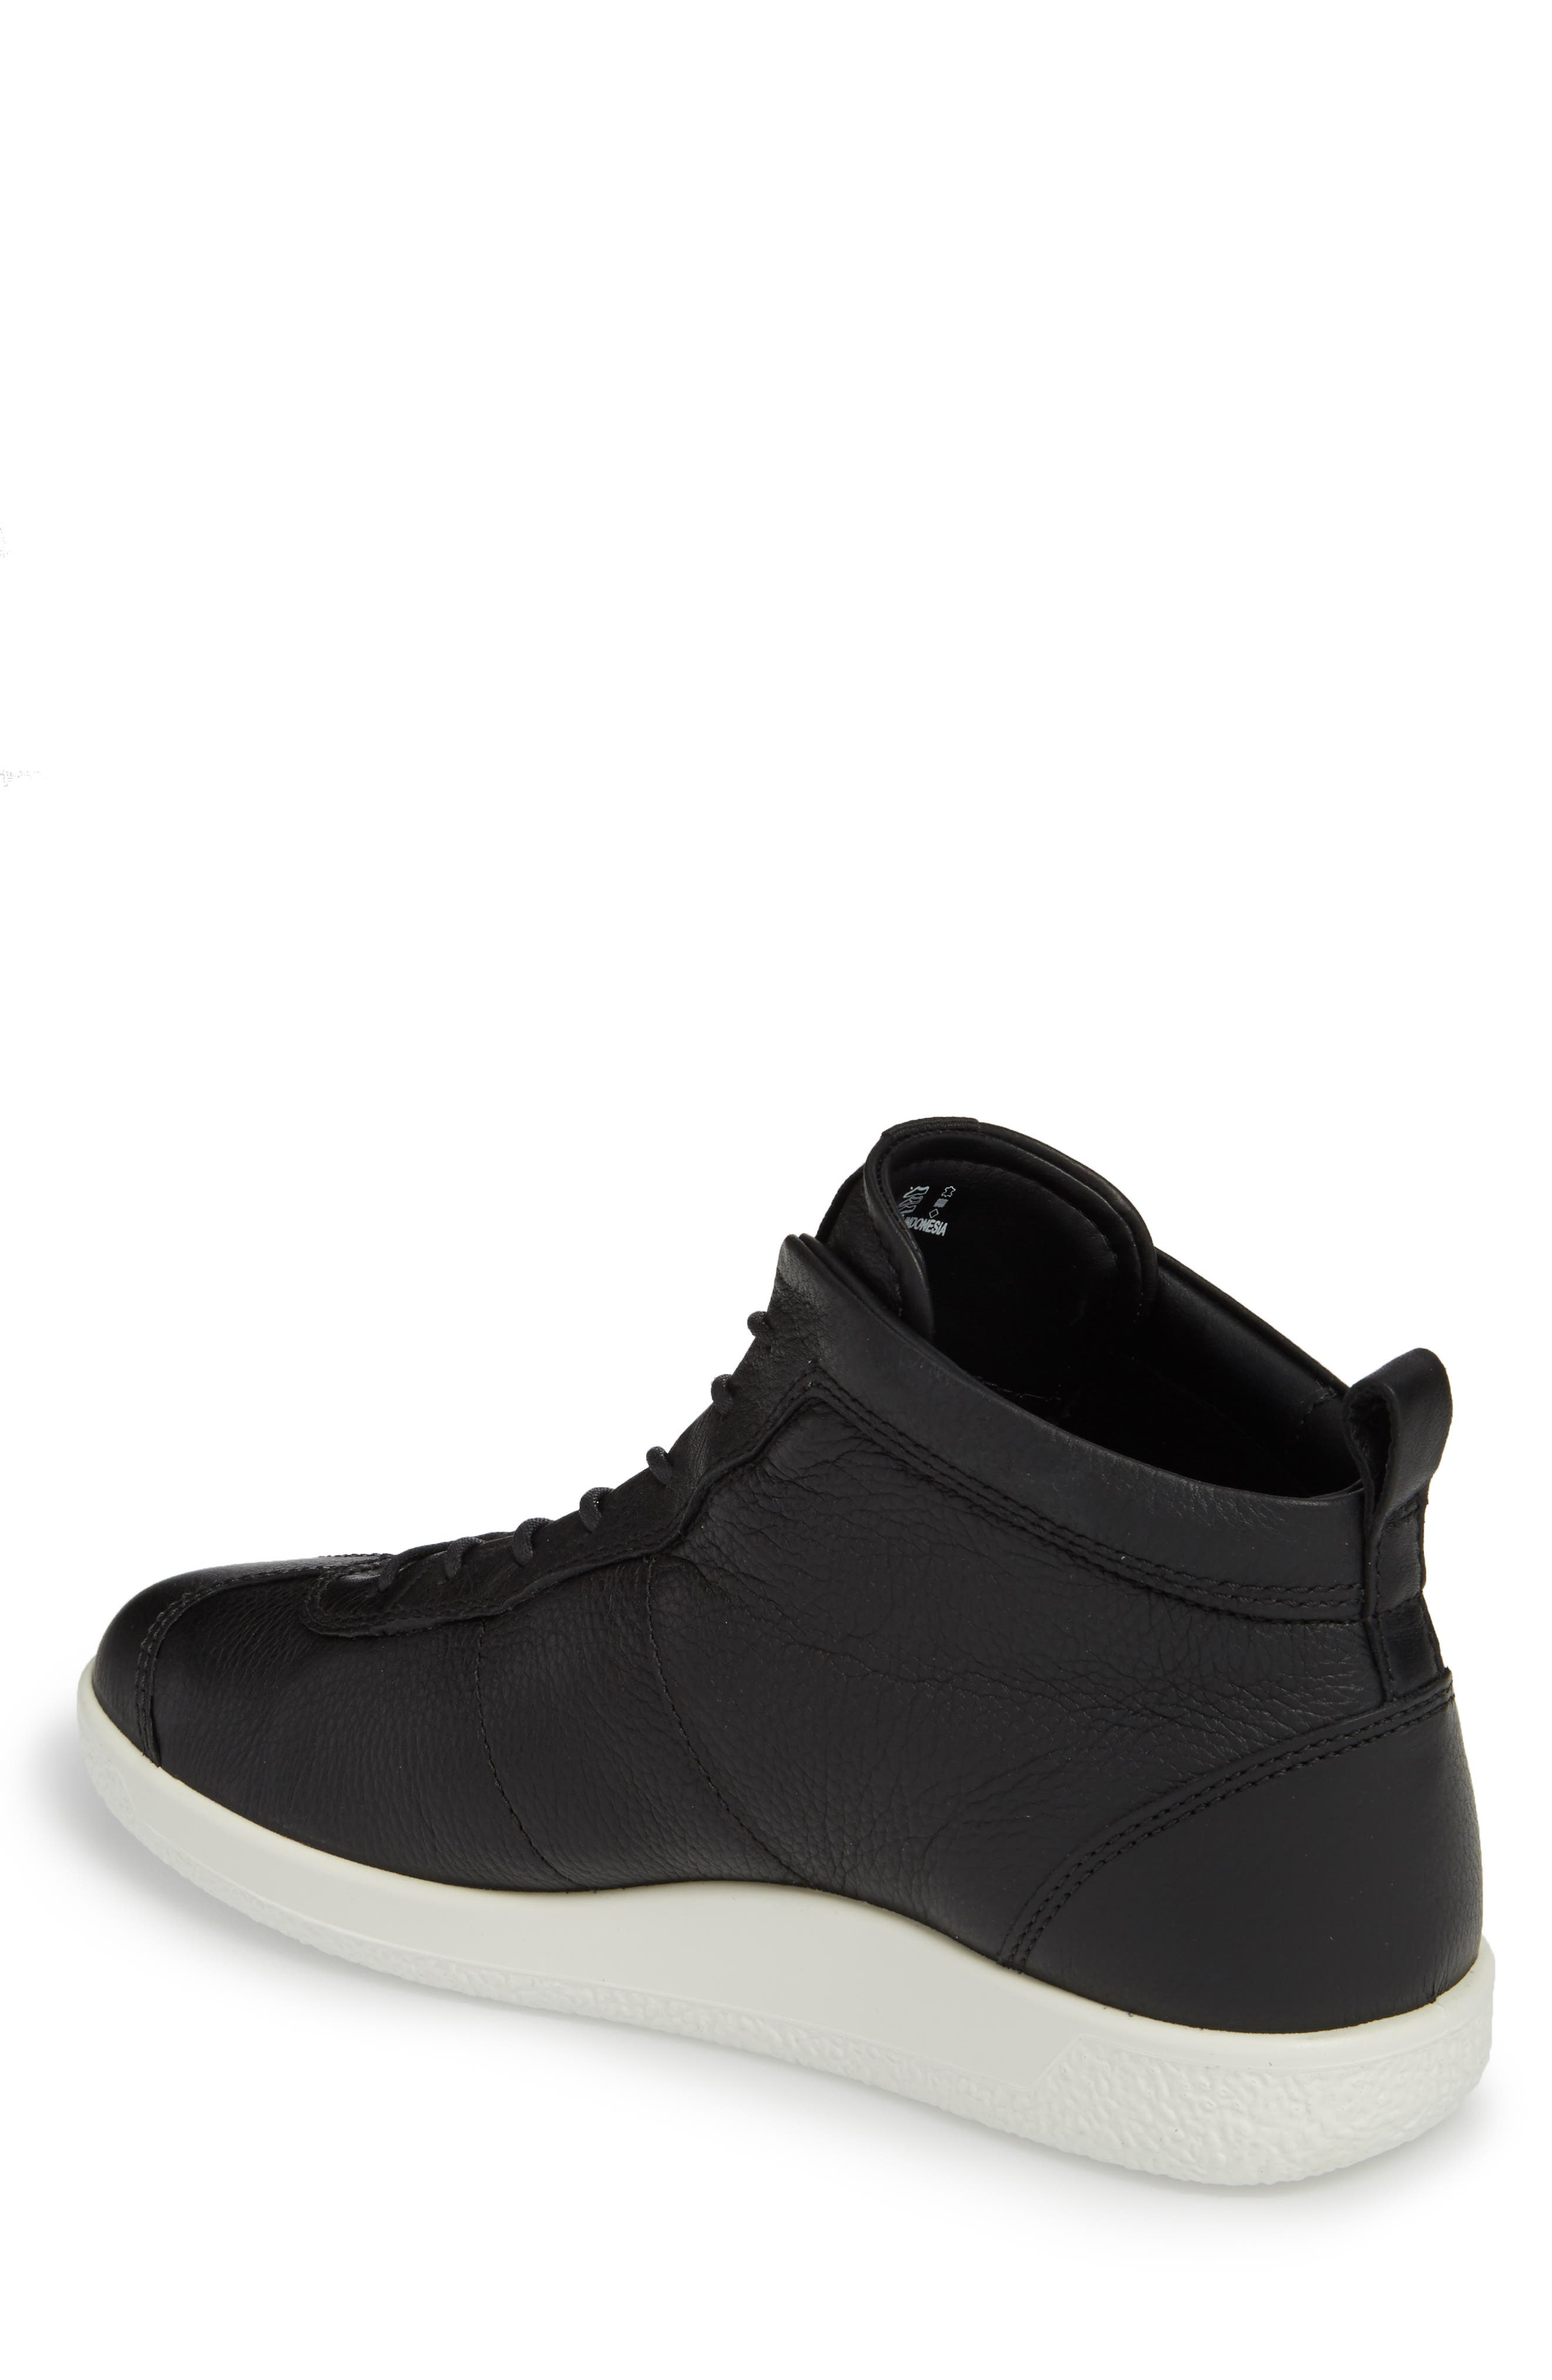 Soft 1 High Top Sneaker,                             Alternate thumbnail 2, color,                             Black Nubuck